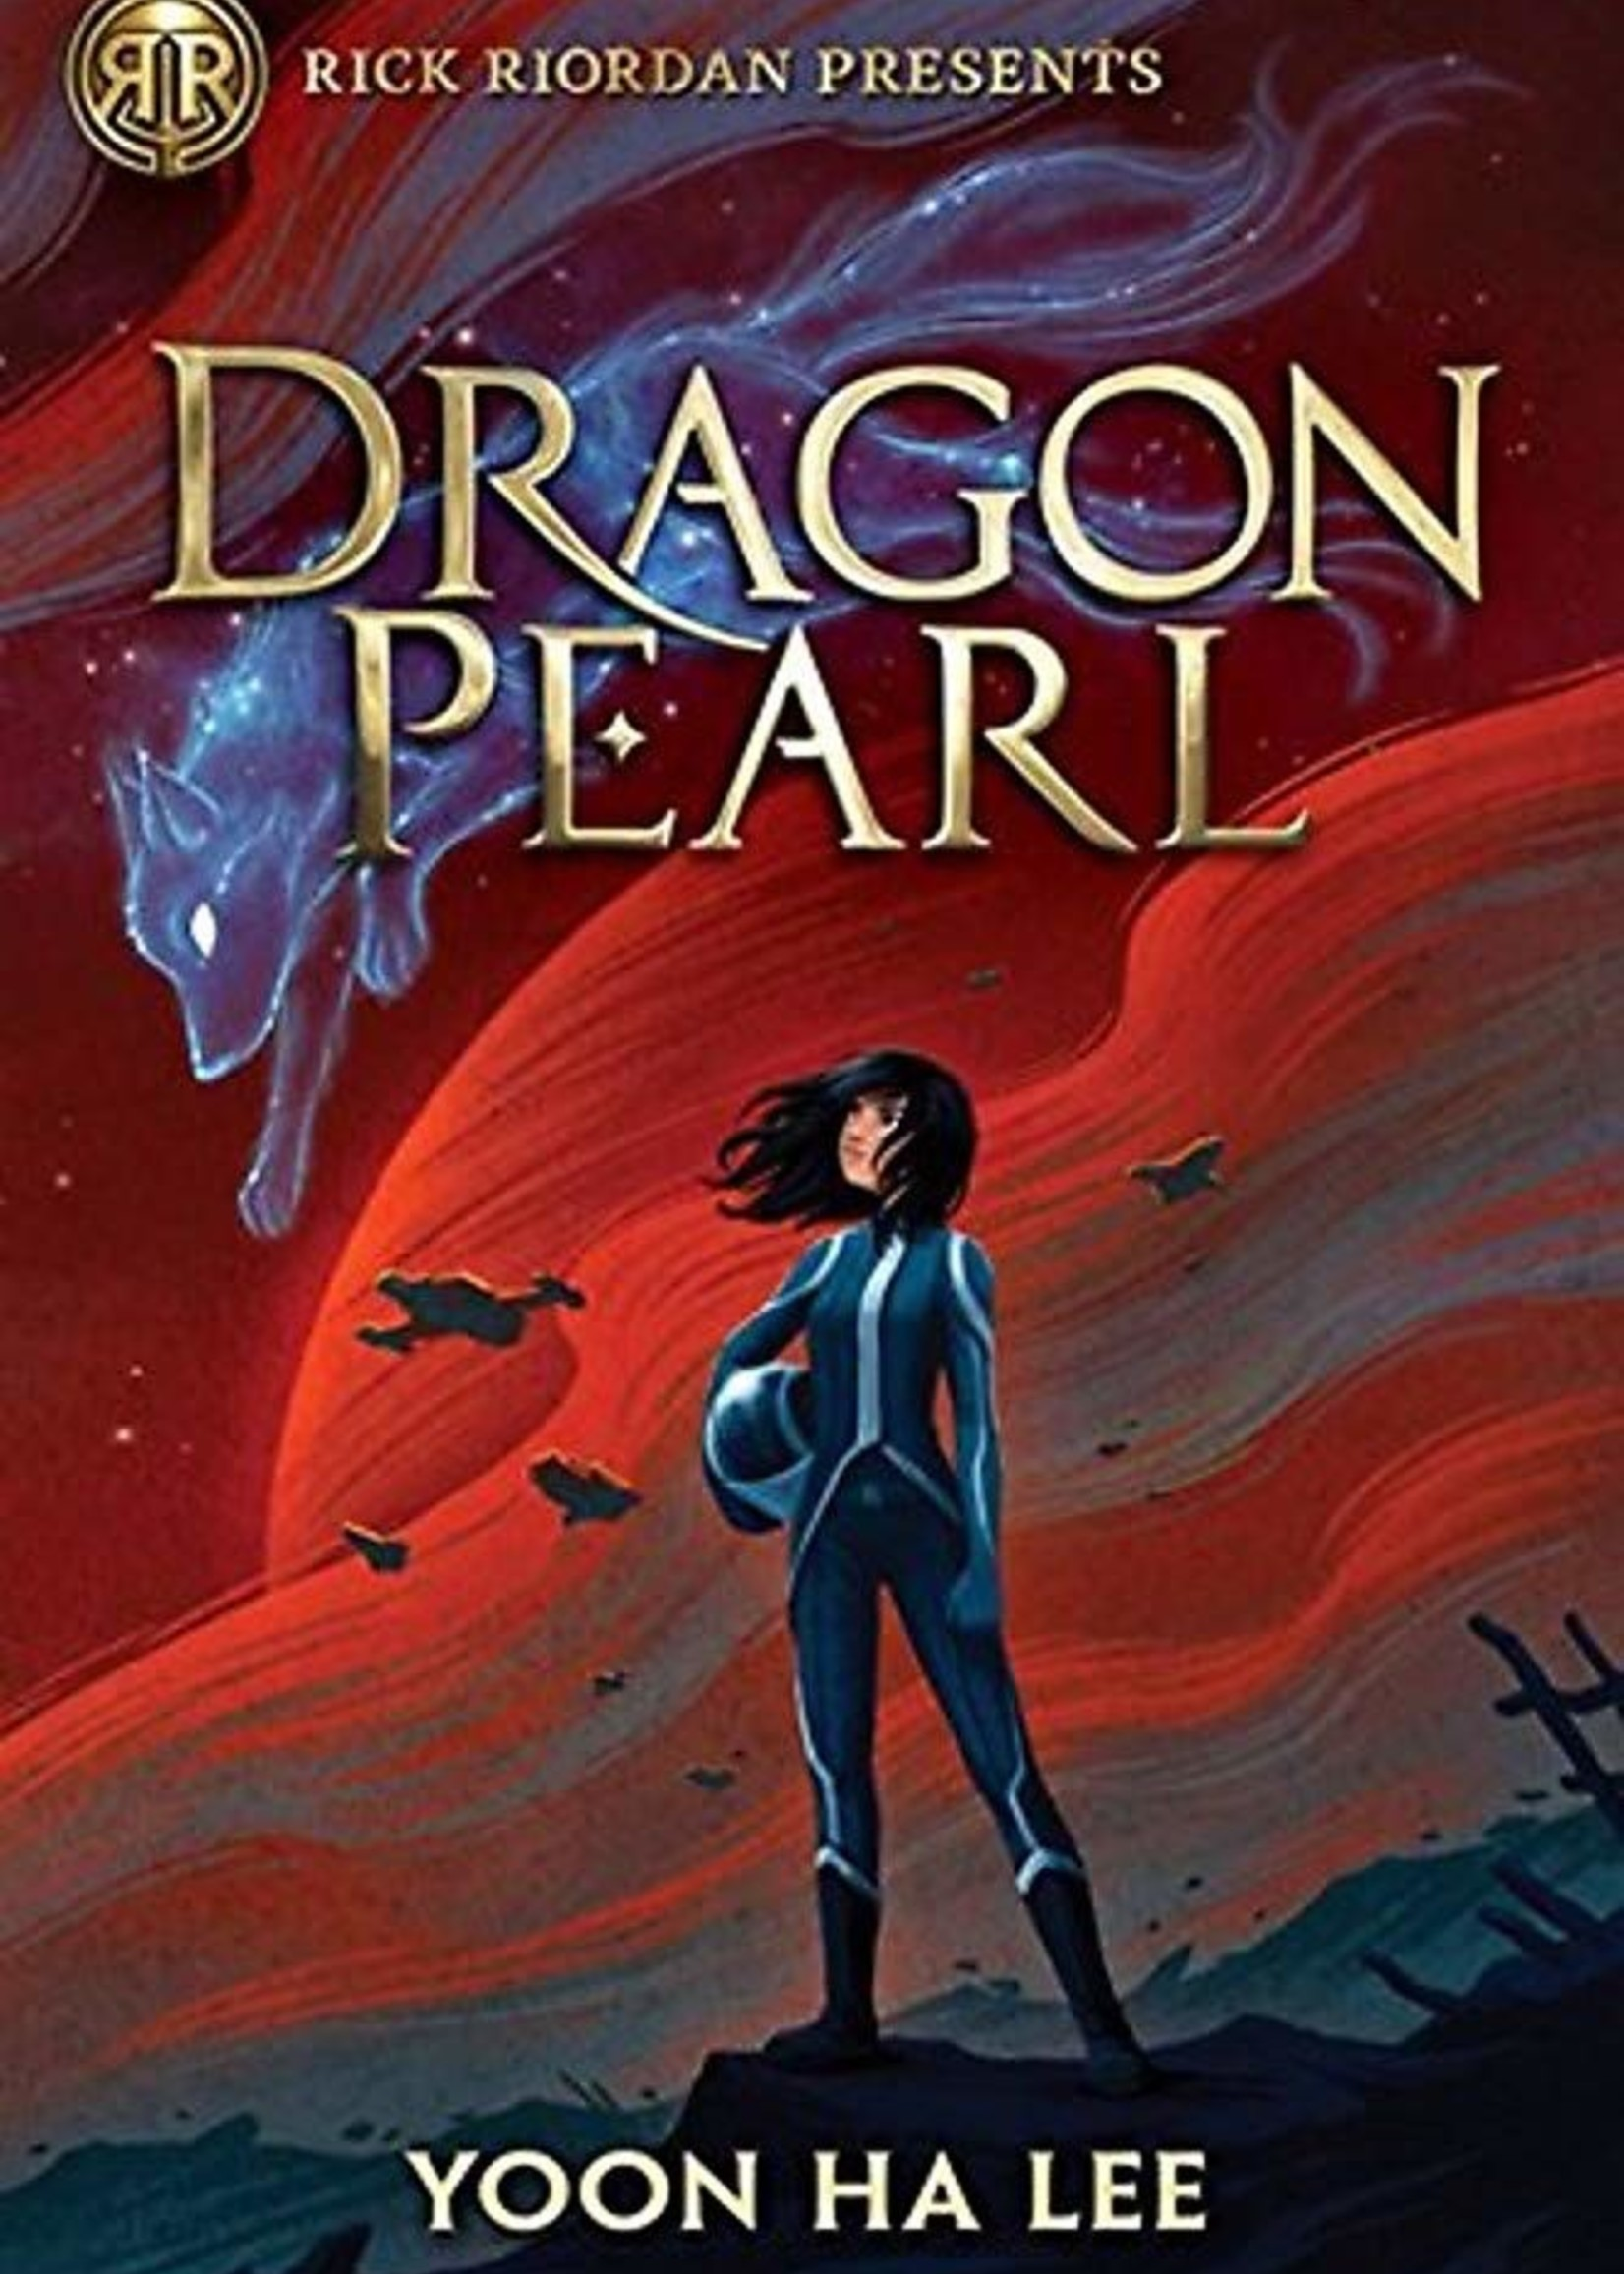 Rick Riordan Presents: Dragon Pearl - Paperback